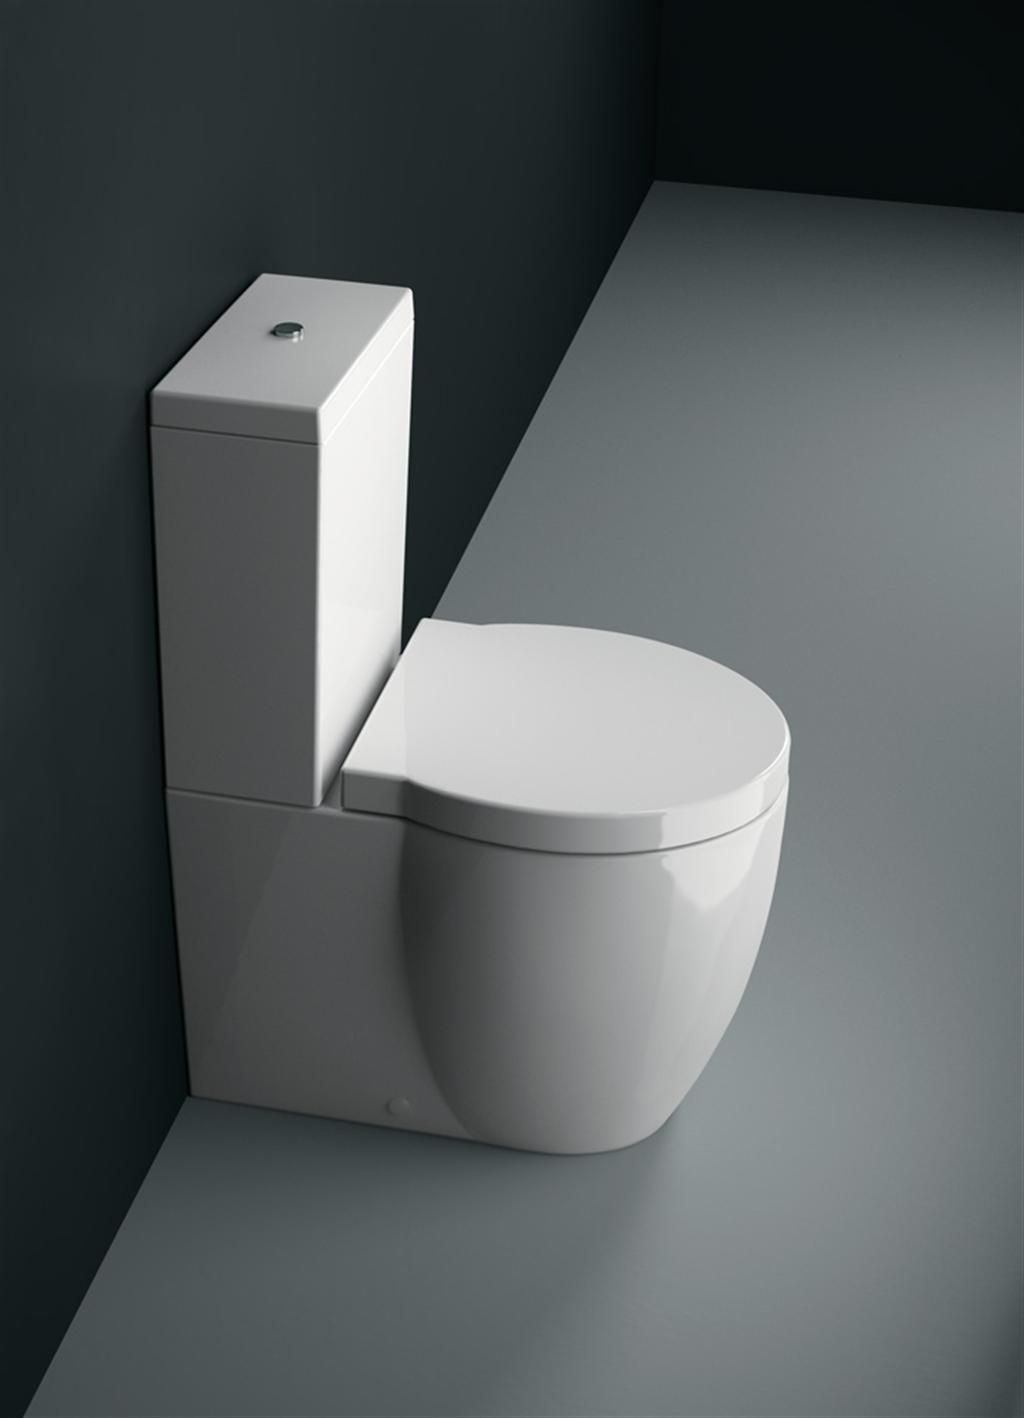 Panorama wc e bidet 65x37 661511 cassetta esterna in ceramica idee case canuto bagno - Aspiratore bagno senza uscita esterna ...